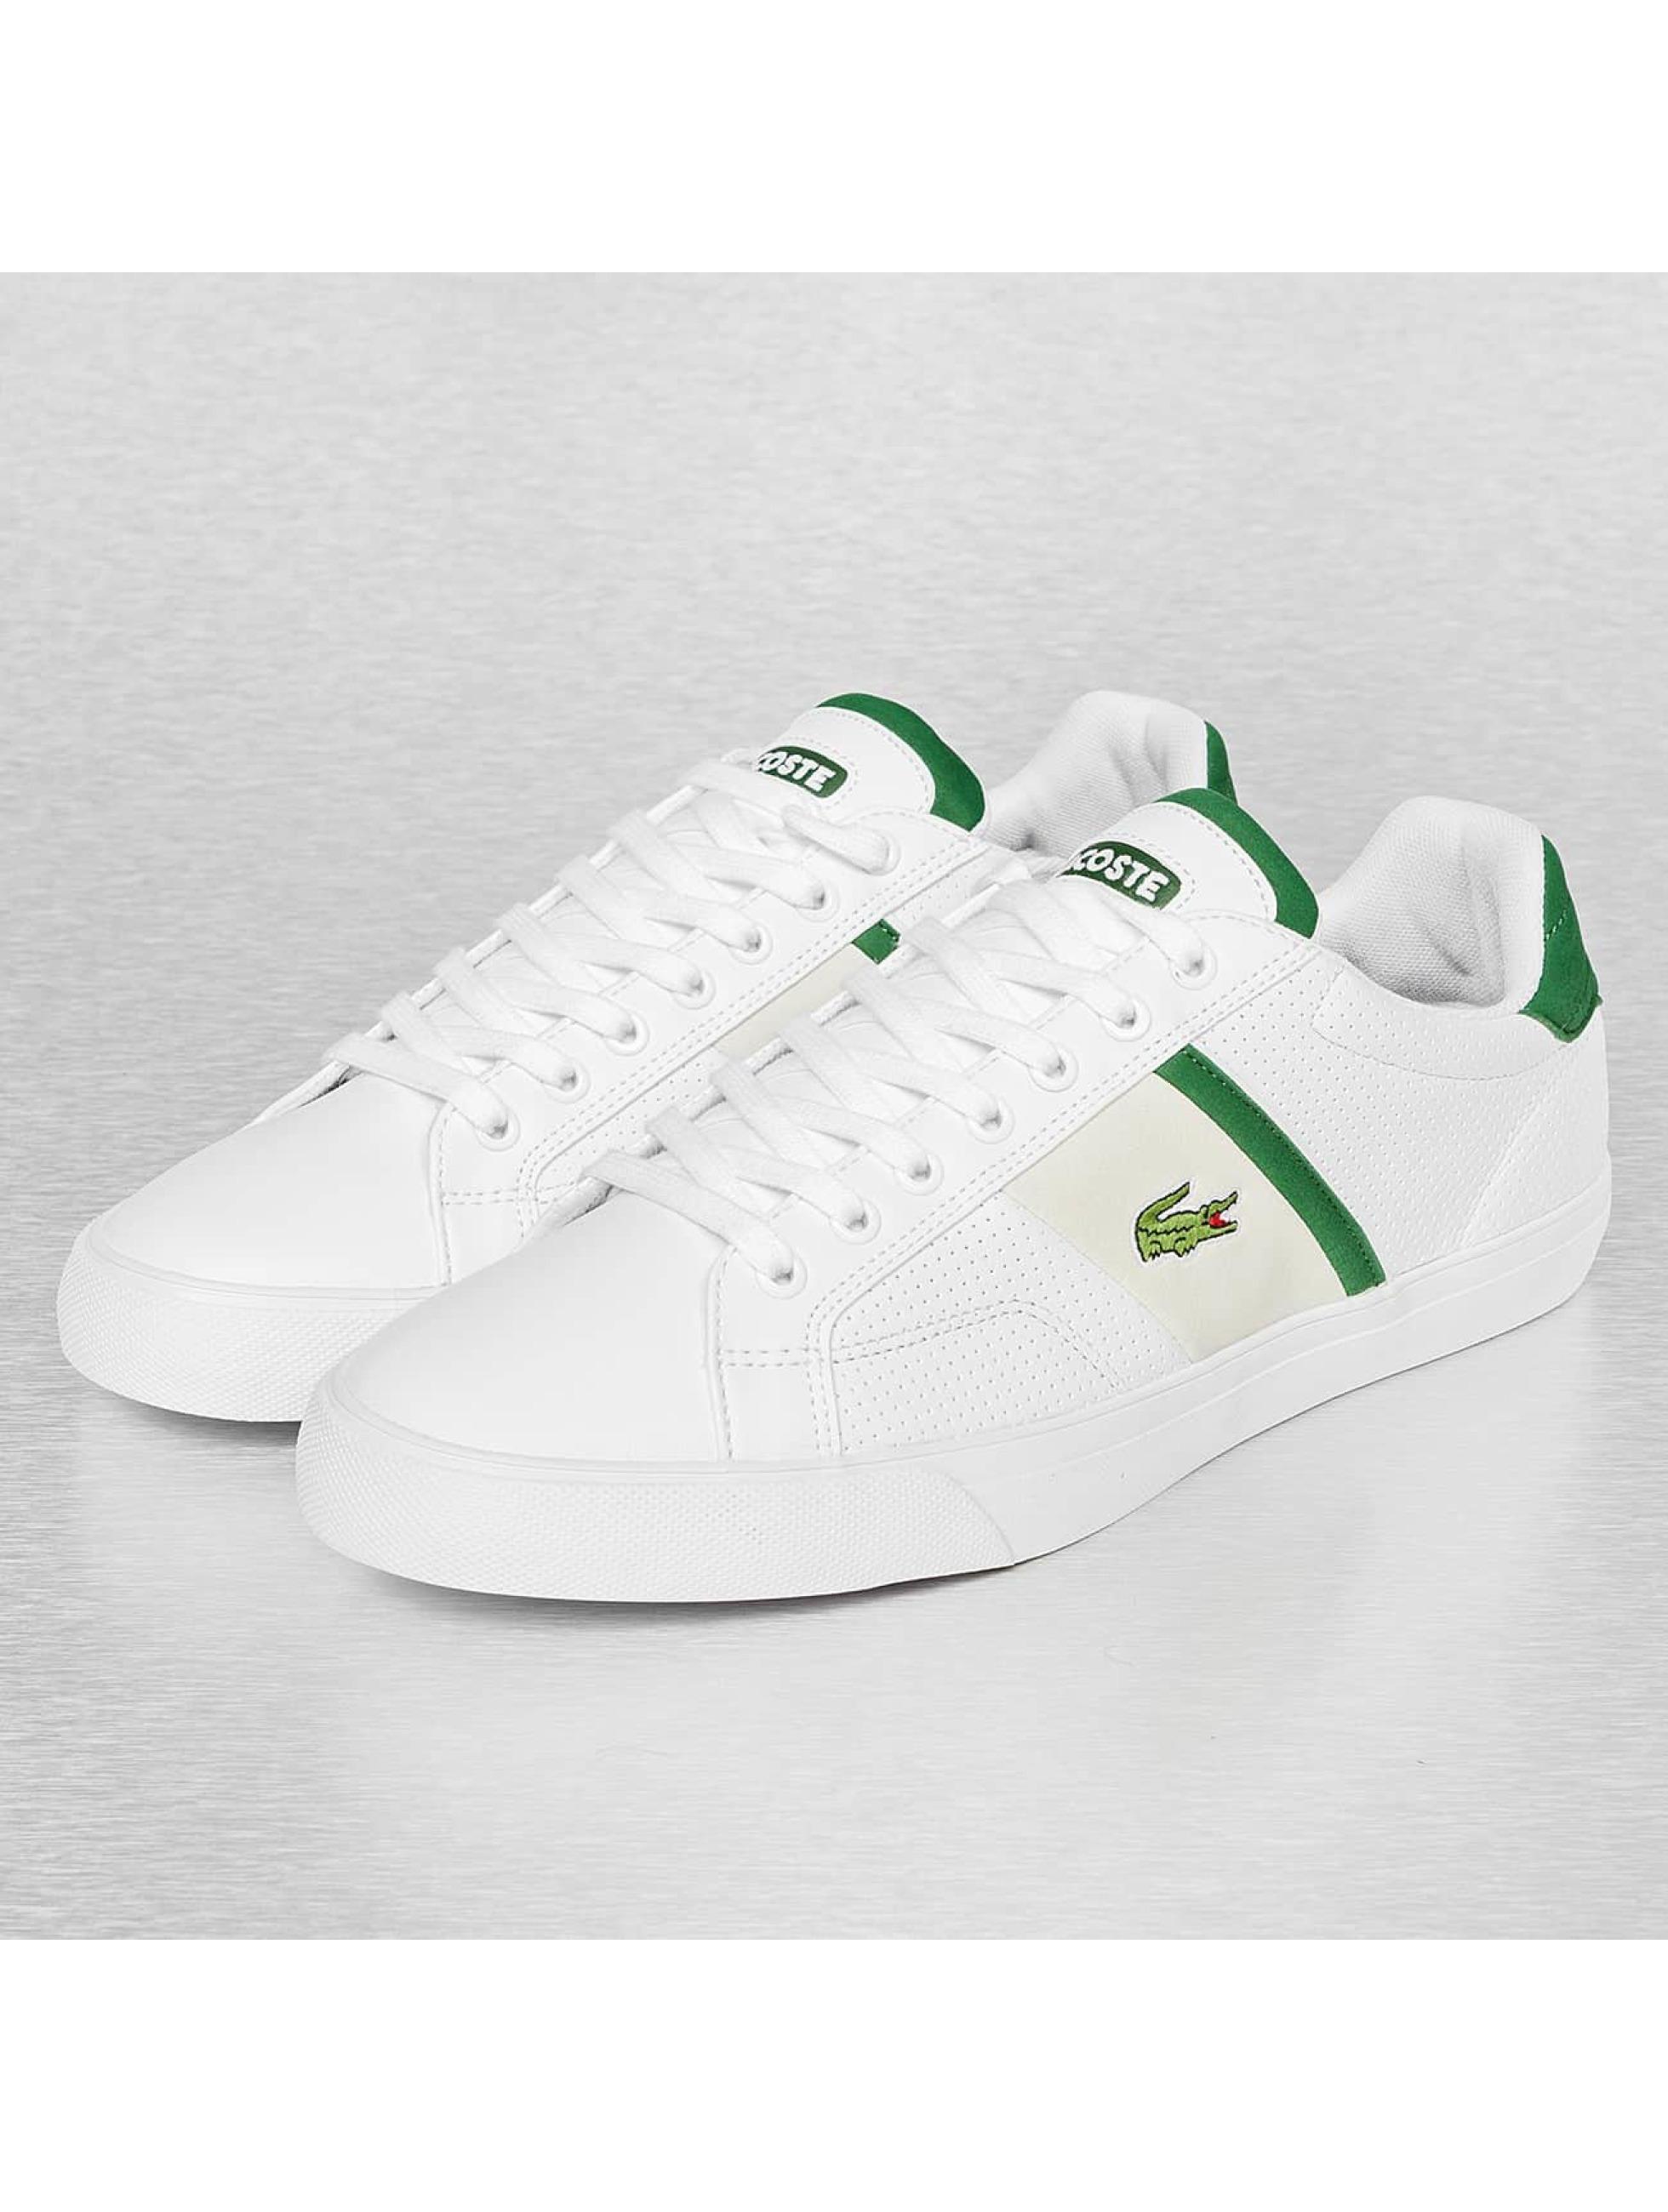 6cb4dfee1a6 chaussures lacoste missouri blanc